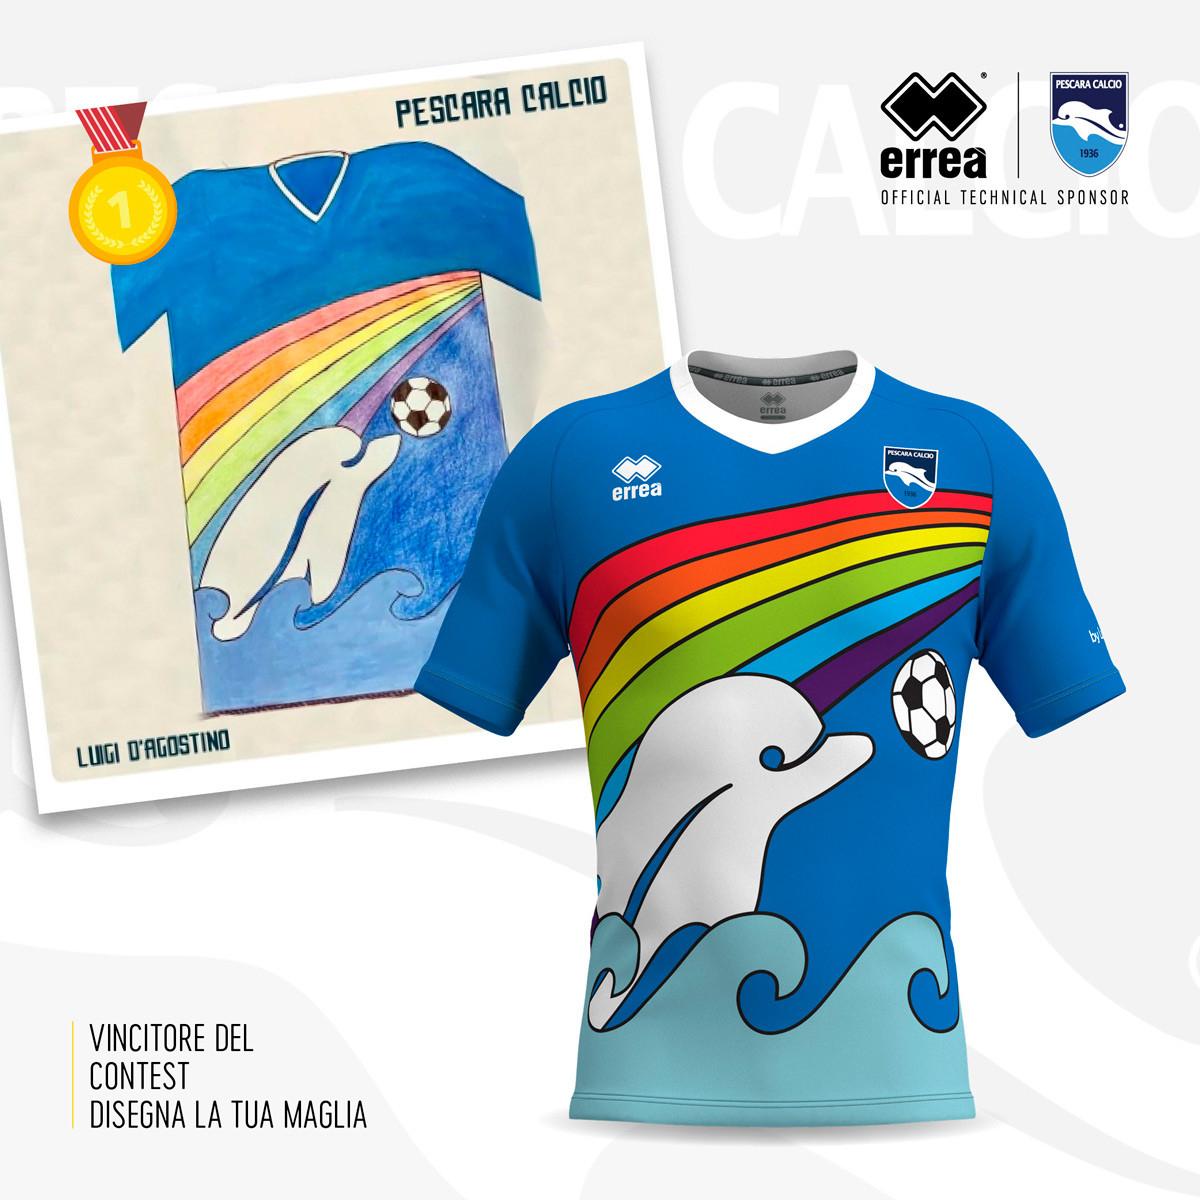 2020 Pescara Special Edition Rainbow Home Shirt £39.99 + £3.75 del at Classic Football Shirts (pre-order)